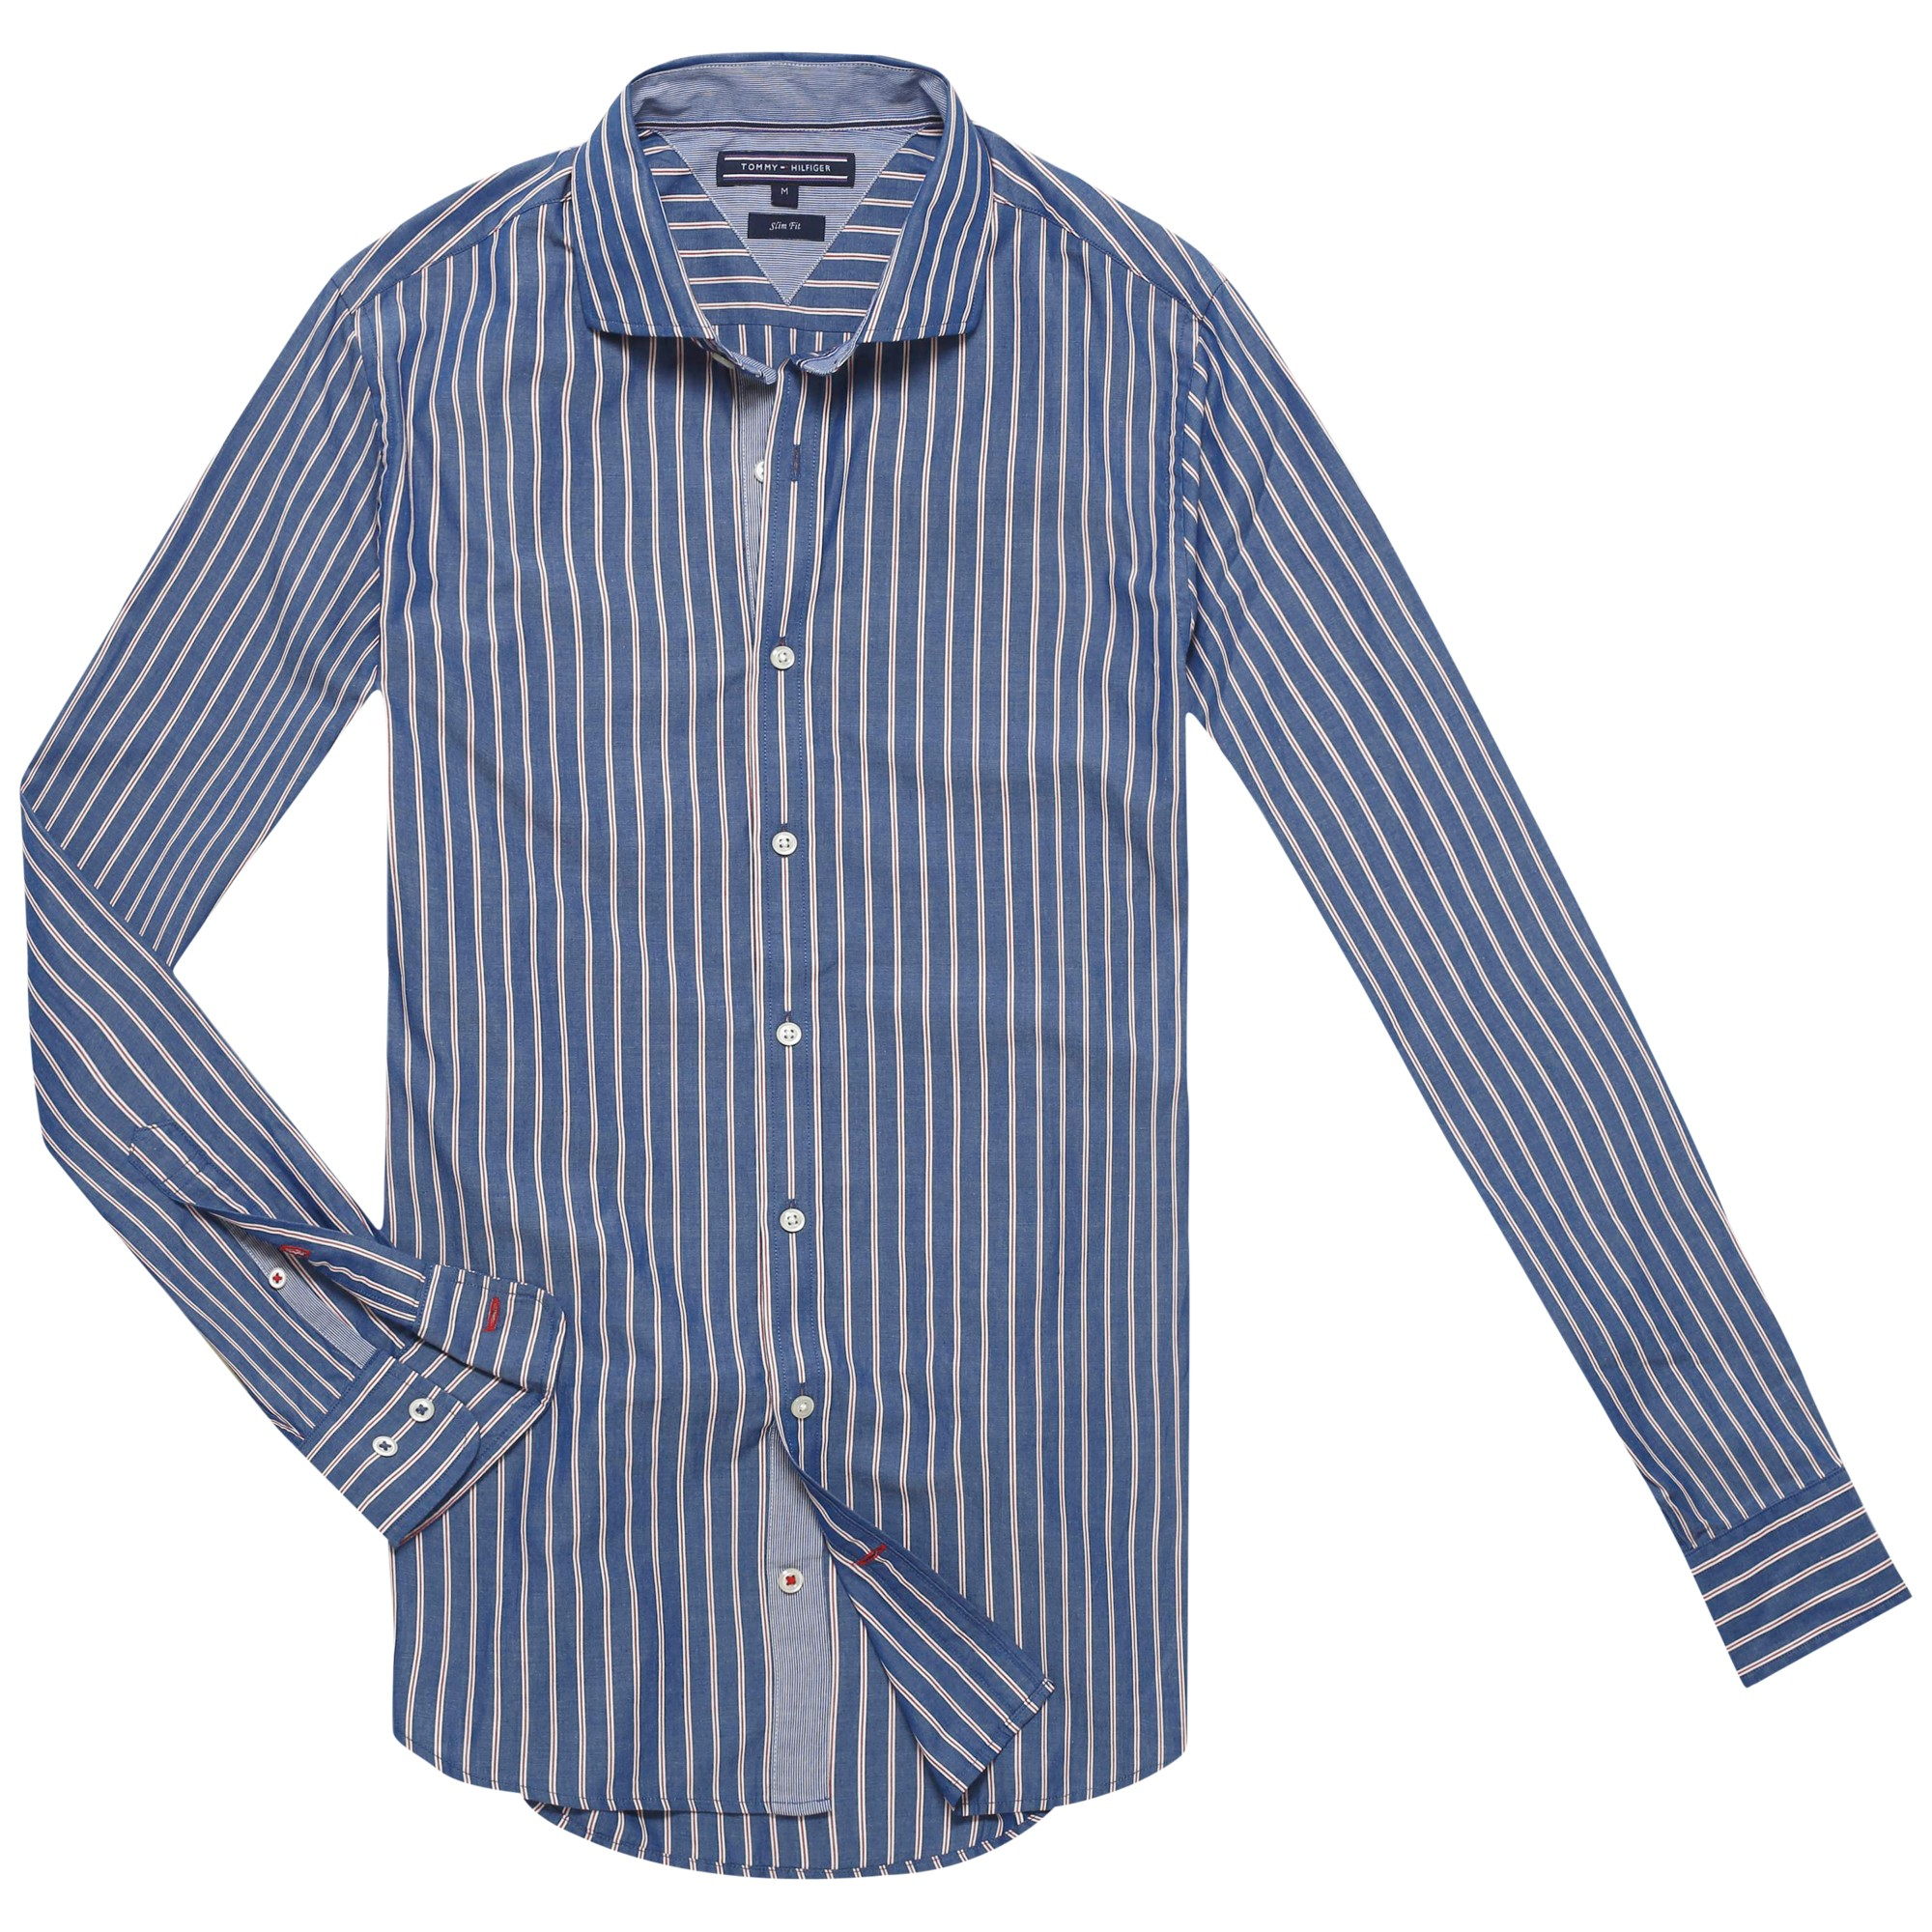 a3f3c226 Tommy Hilfiger Sunland Stripe Shirt in Blue for Men - Lyst